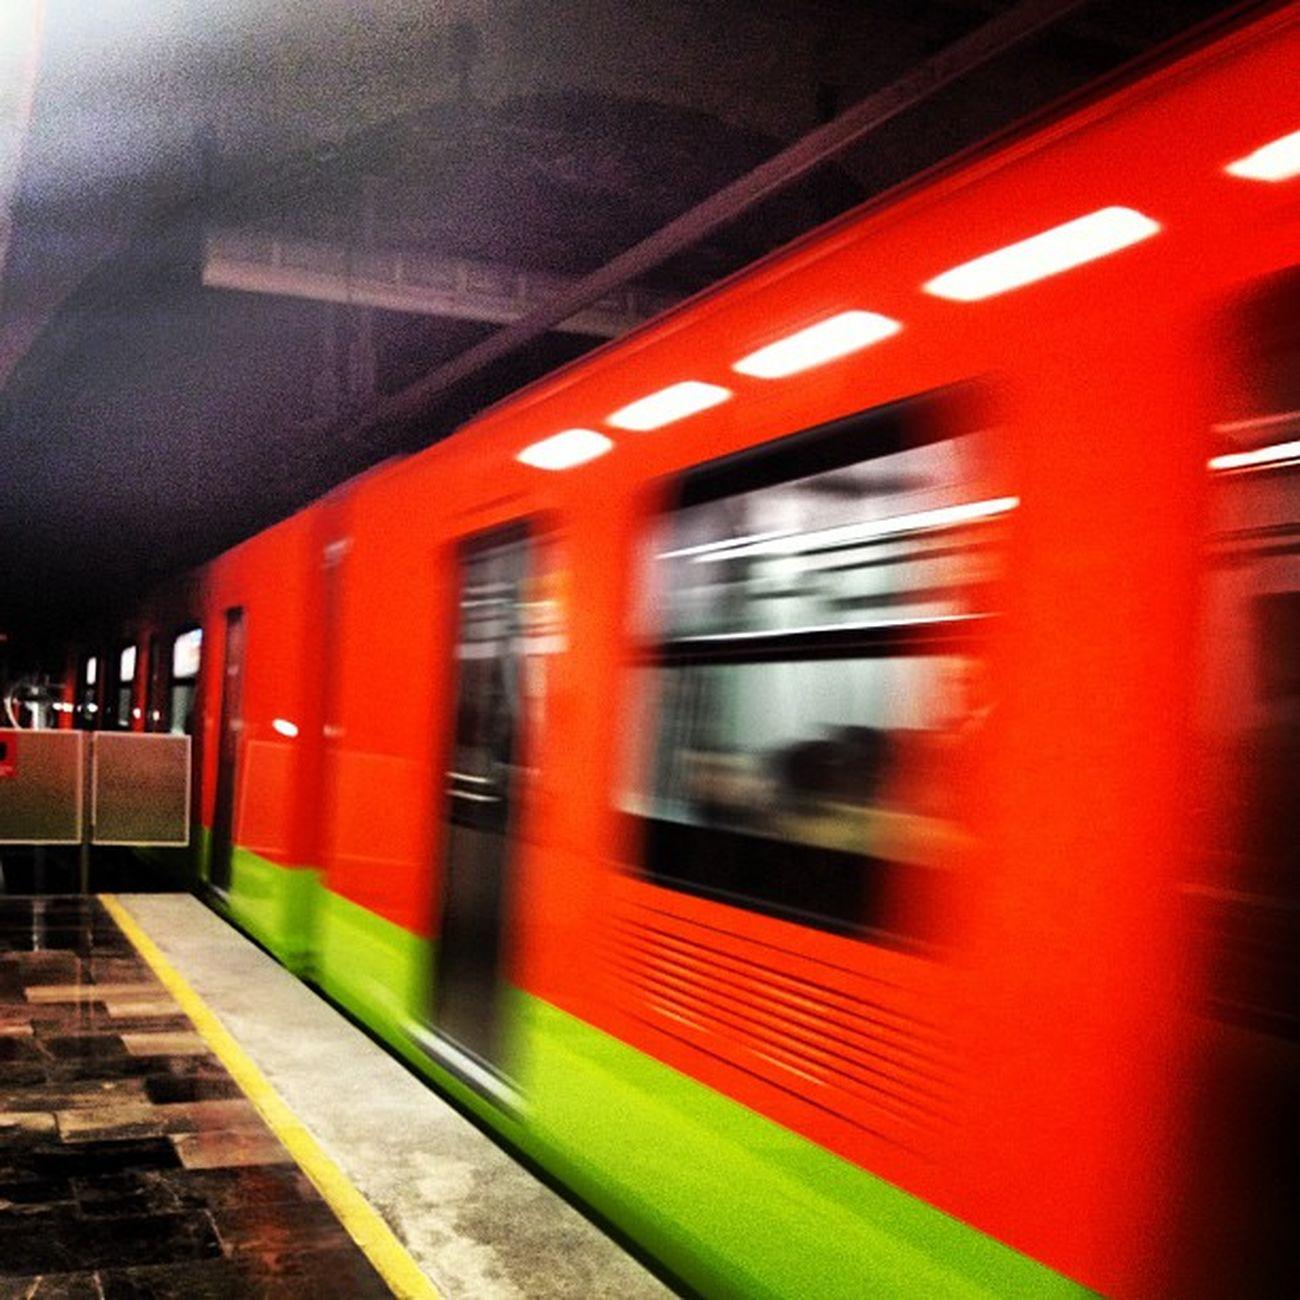 #igers #igersdf #proyectodf #metro #subway #underground #linea12 #df #veloz #travel #mexico Proyectodf Mexingers Subway Igersgdl Metro Compartetuimagen Downtown Linea12 Underground Tranporte Travel Veloz Mexico Traveler Df Mextagram Igers Tranport Igersmexico Igersmty Igersdf